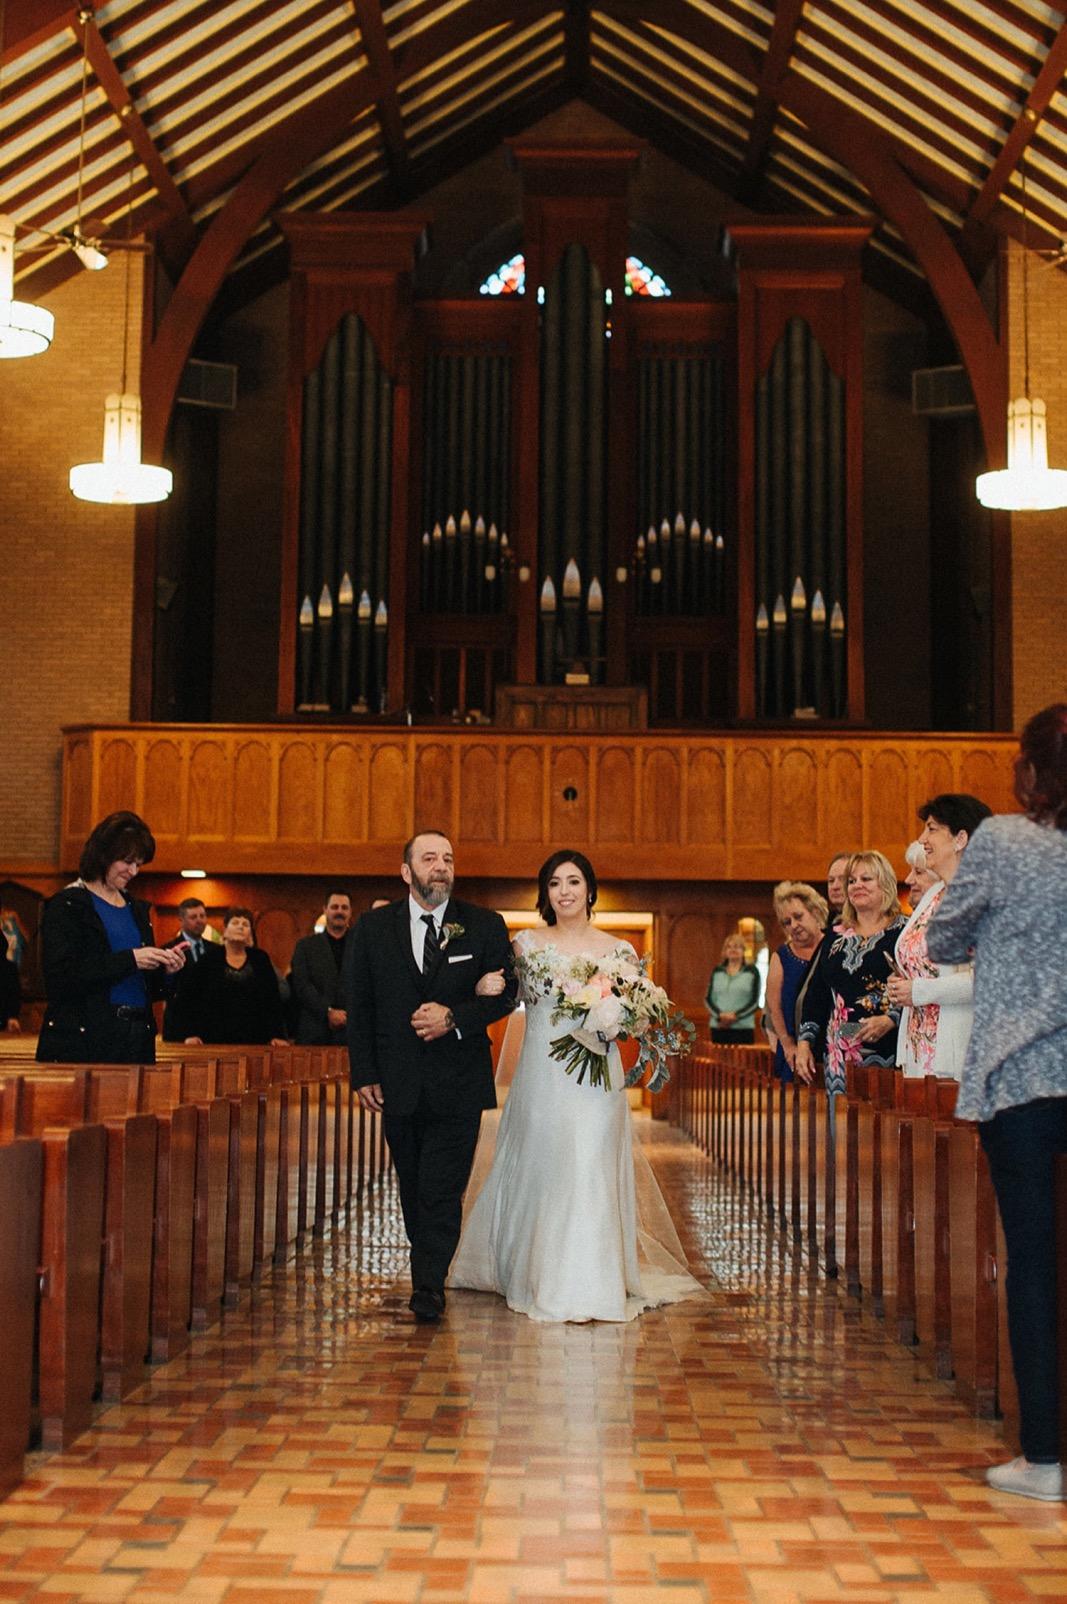 20_bucks_county_HollyHedge_wedding_photography_spring.jpg